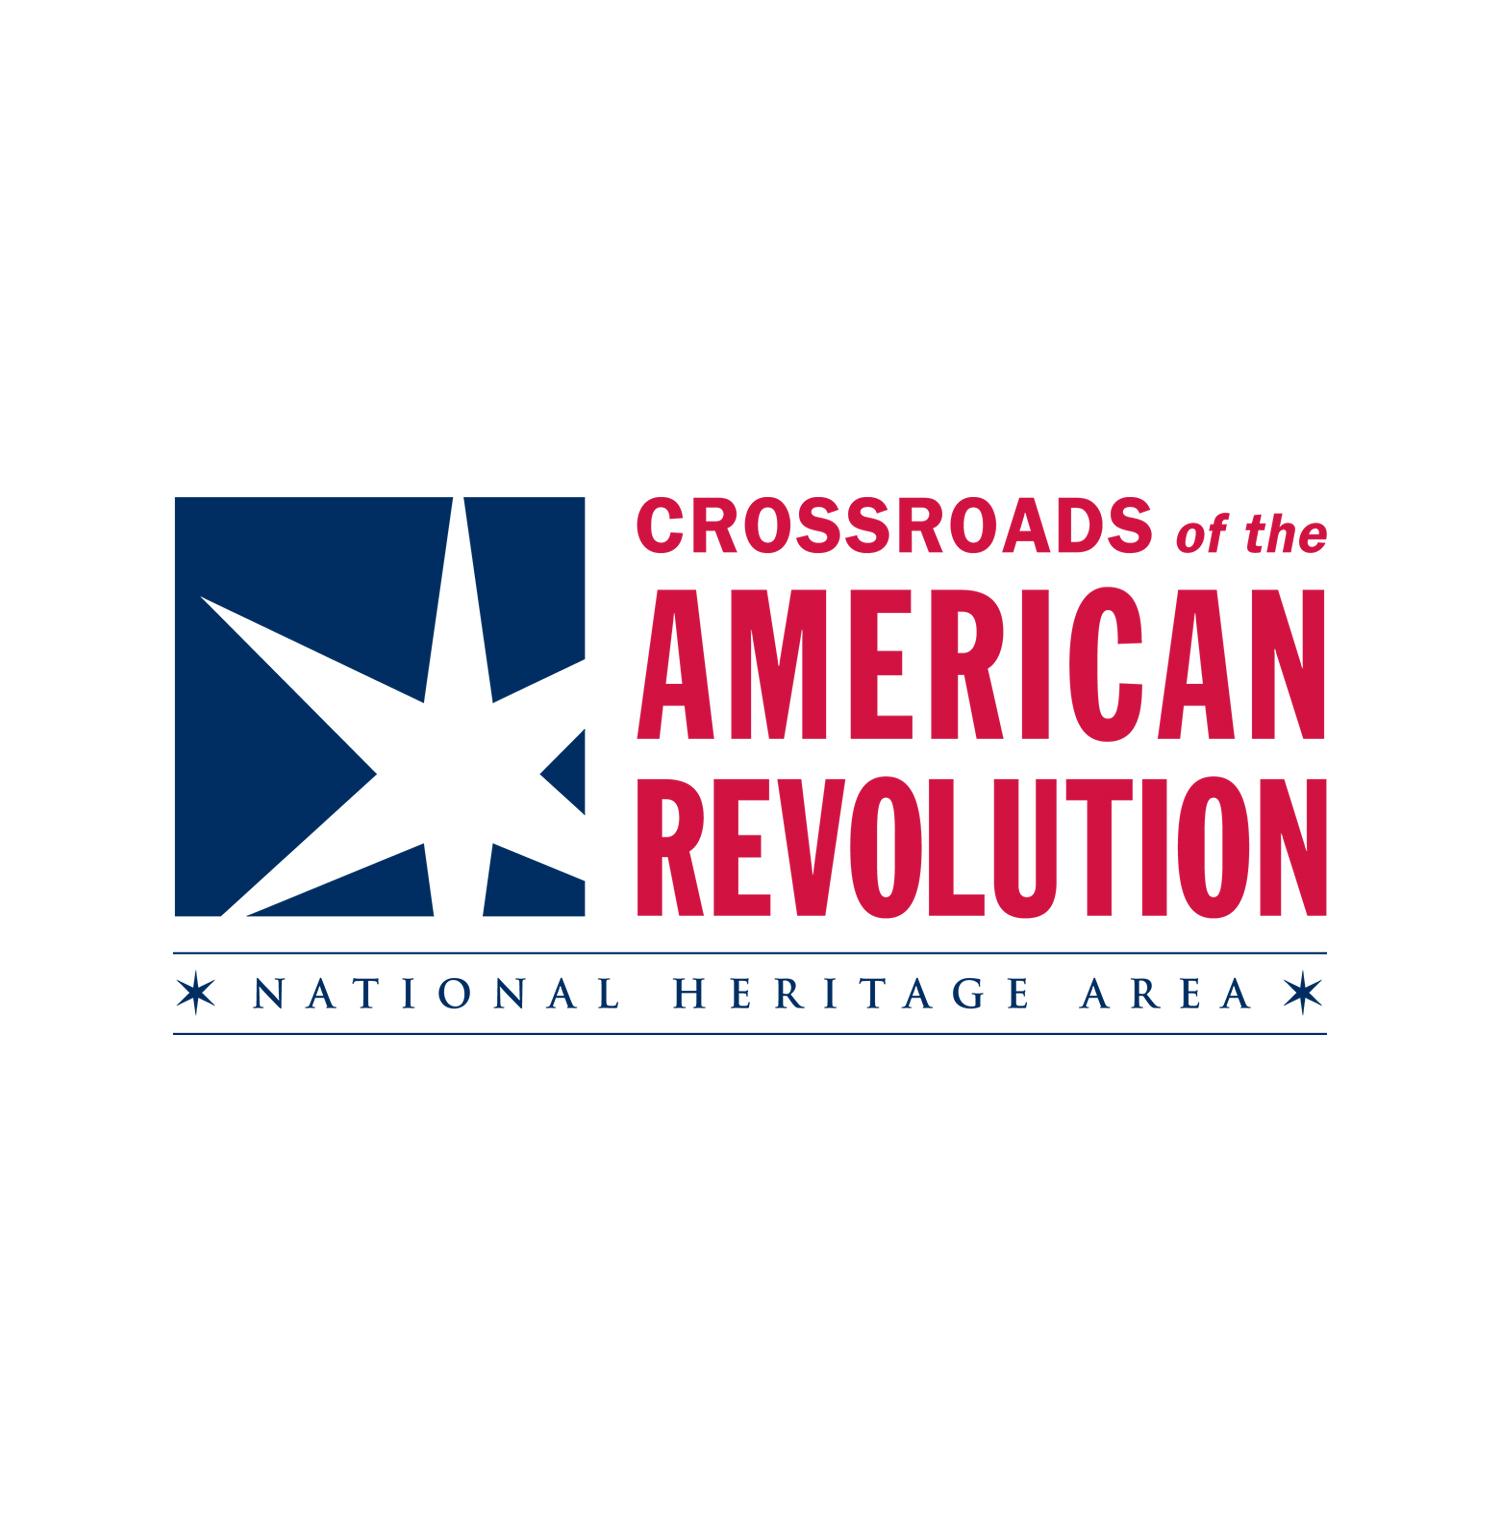 Crossroads of the American Revolution logo